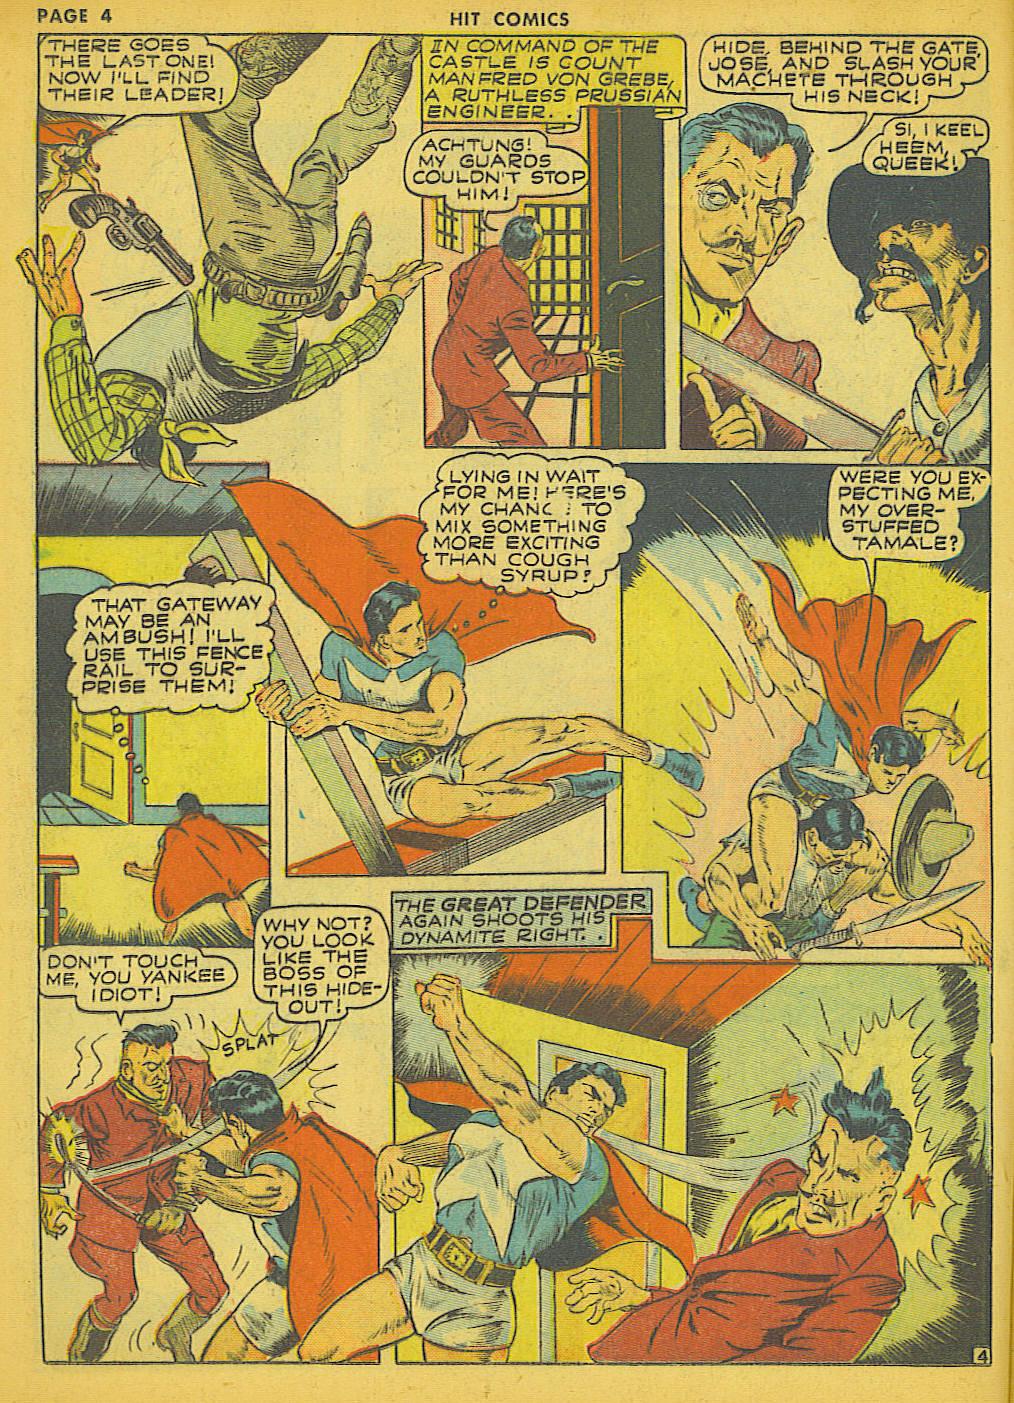 Read online Hit Comics comic -  Issue #21 - 6